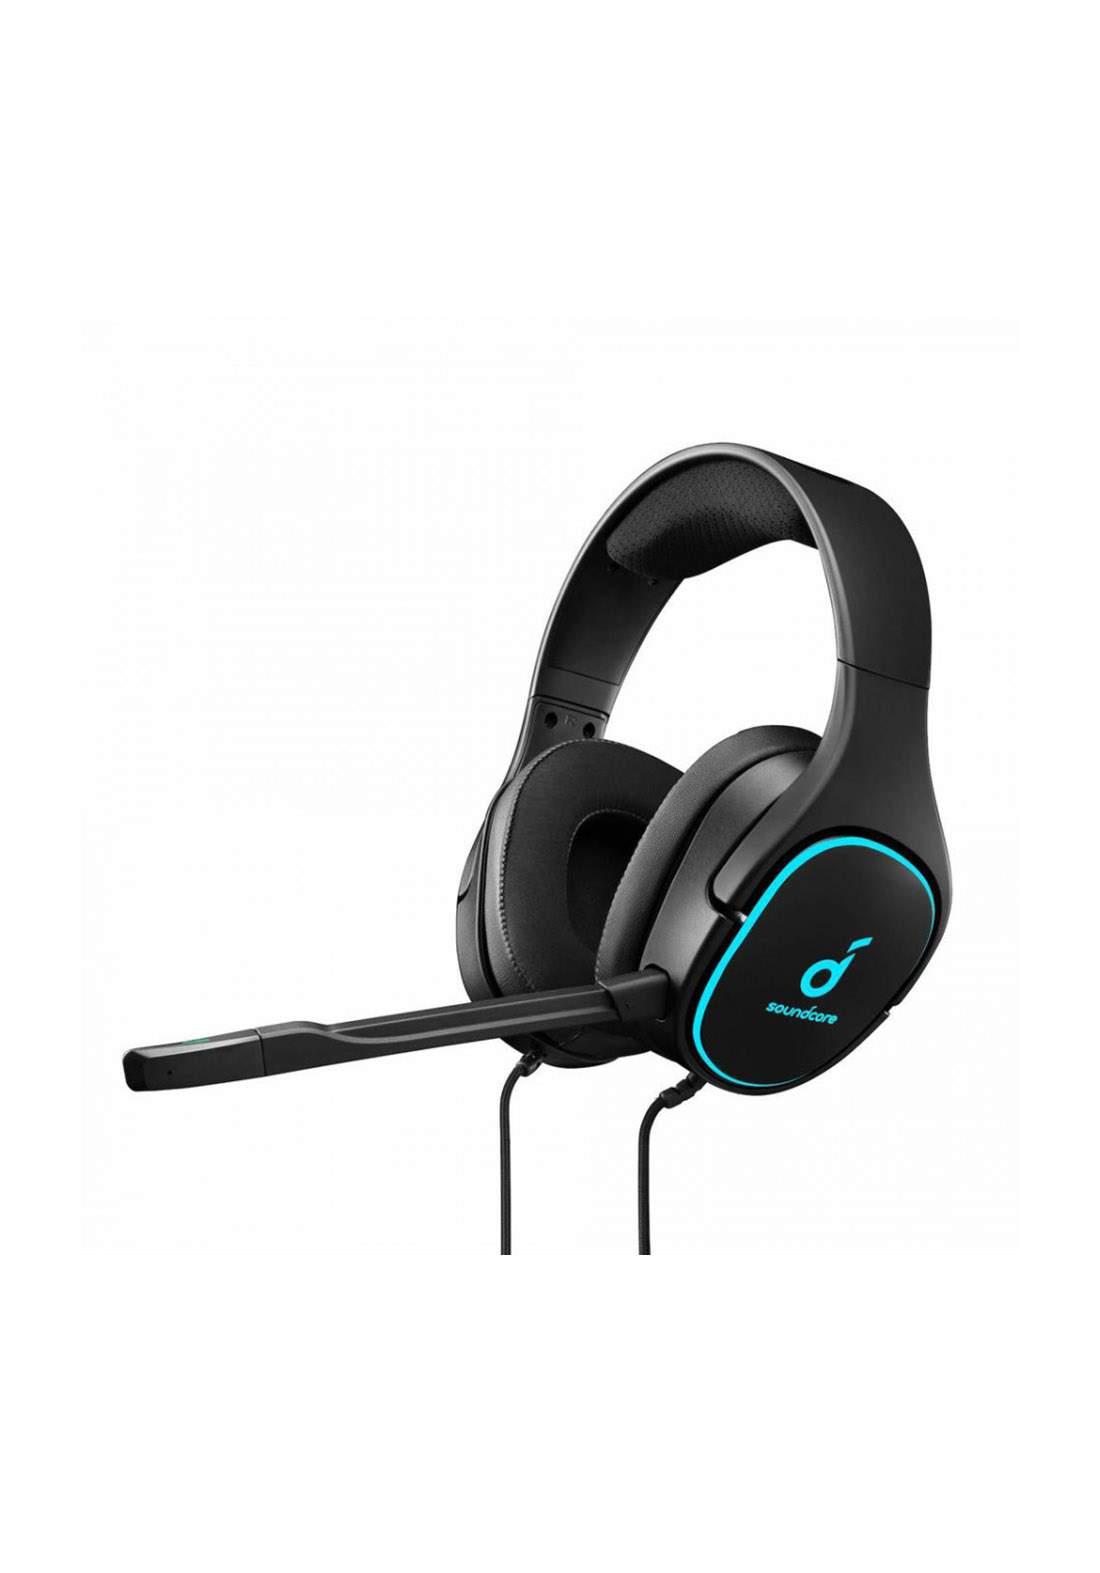 Anker A38300 Virtual 7.1 Surround Sound Headphones - Black سماعة